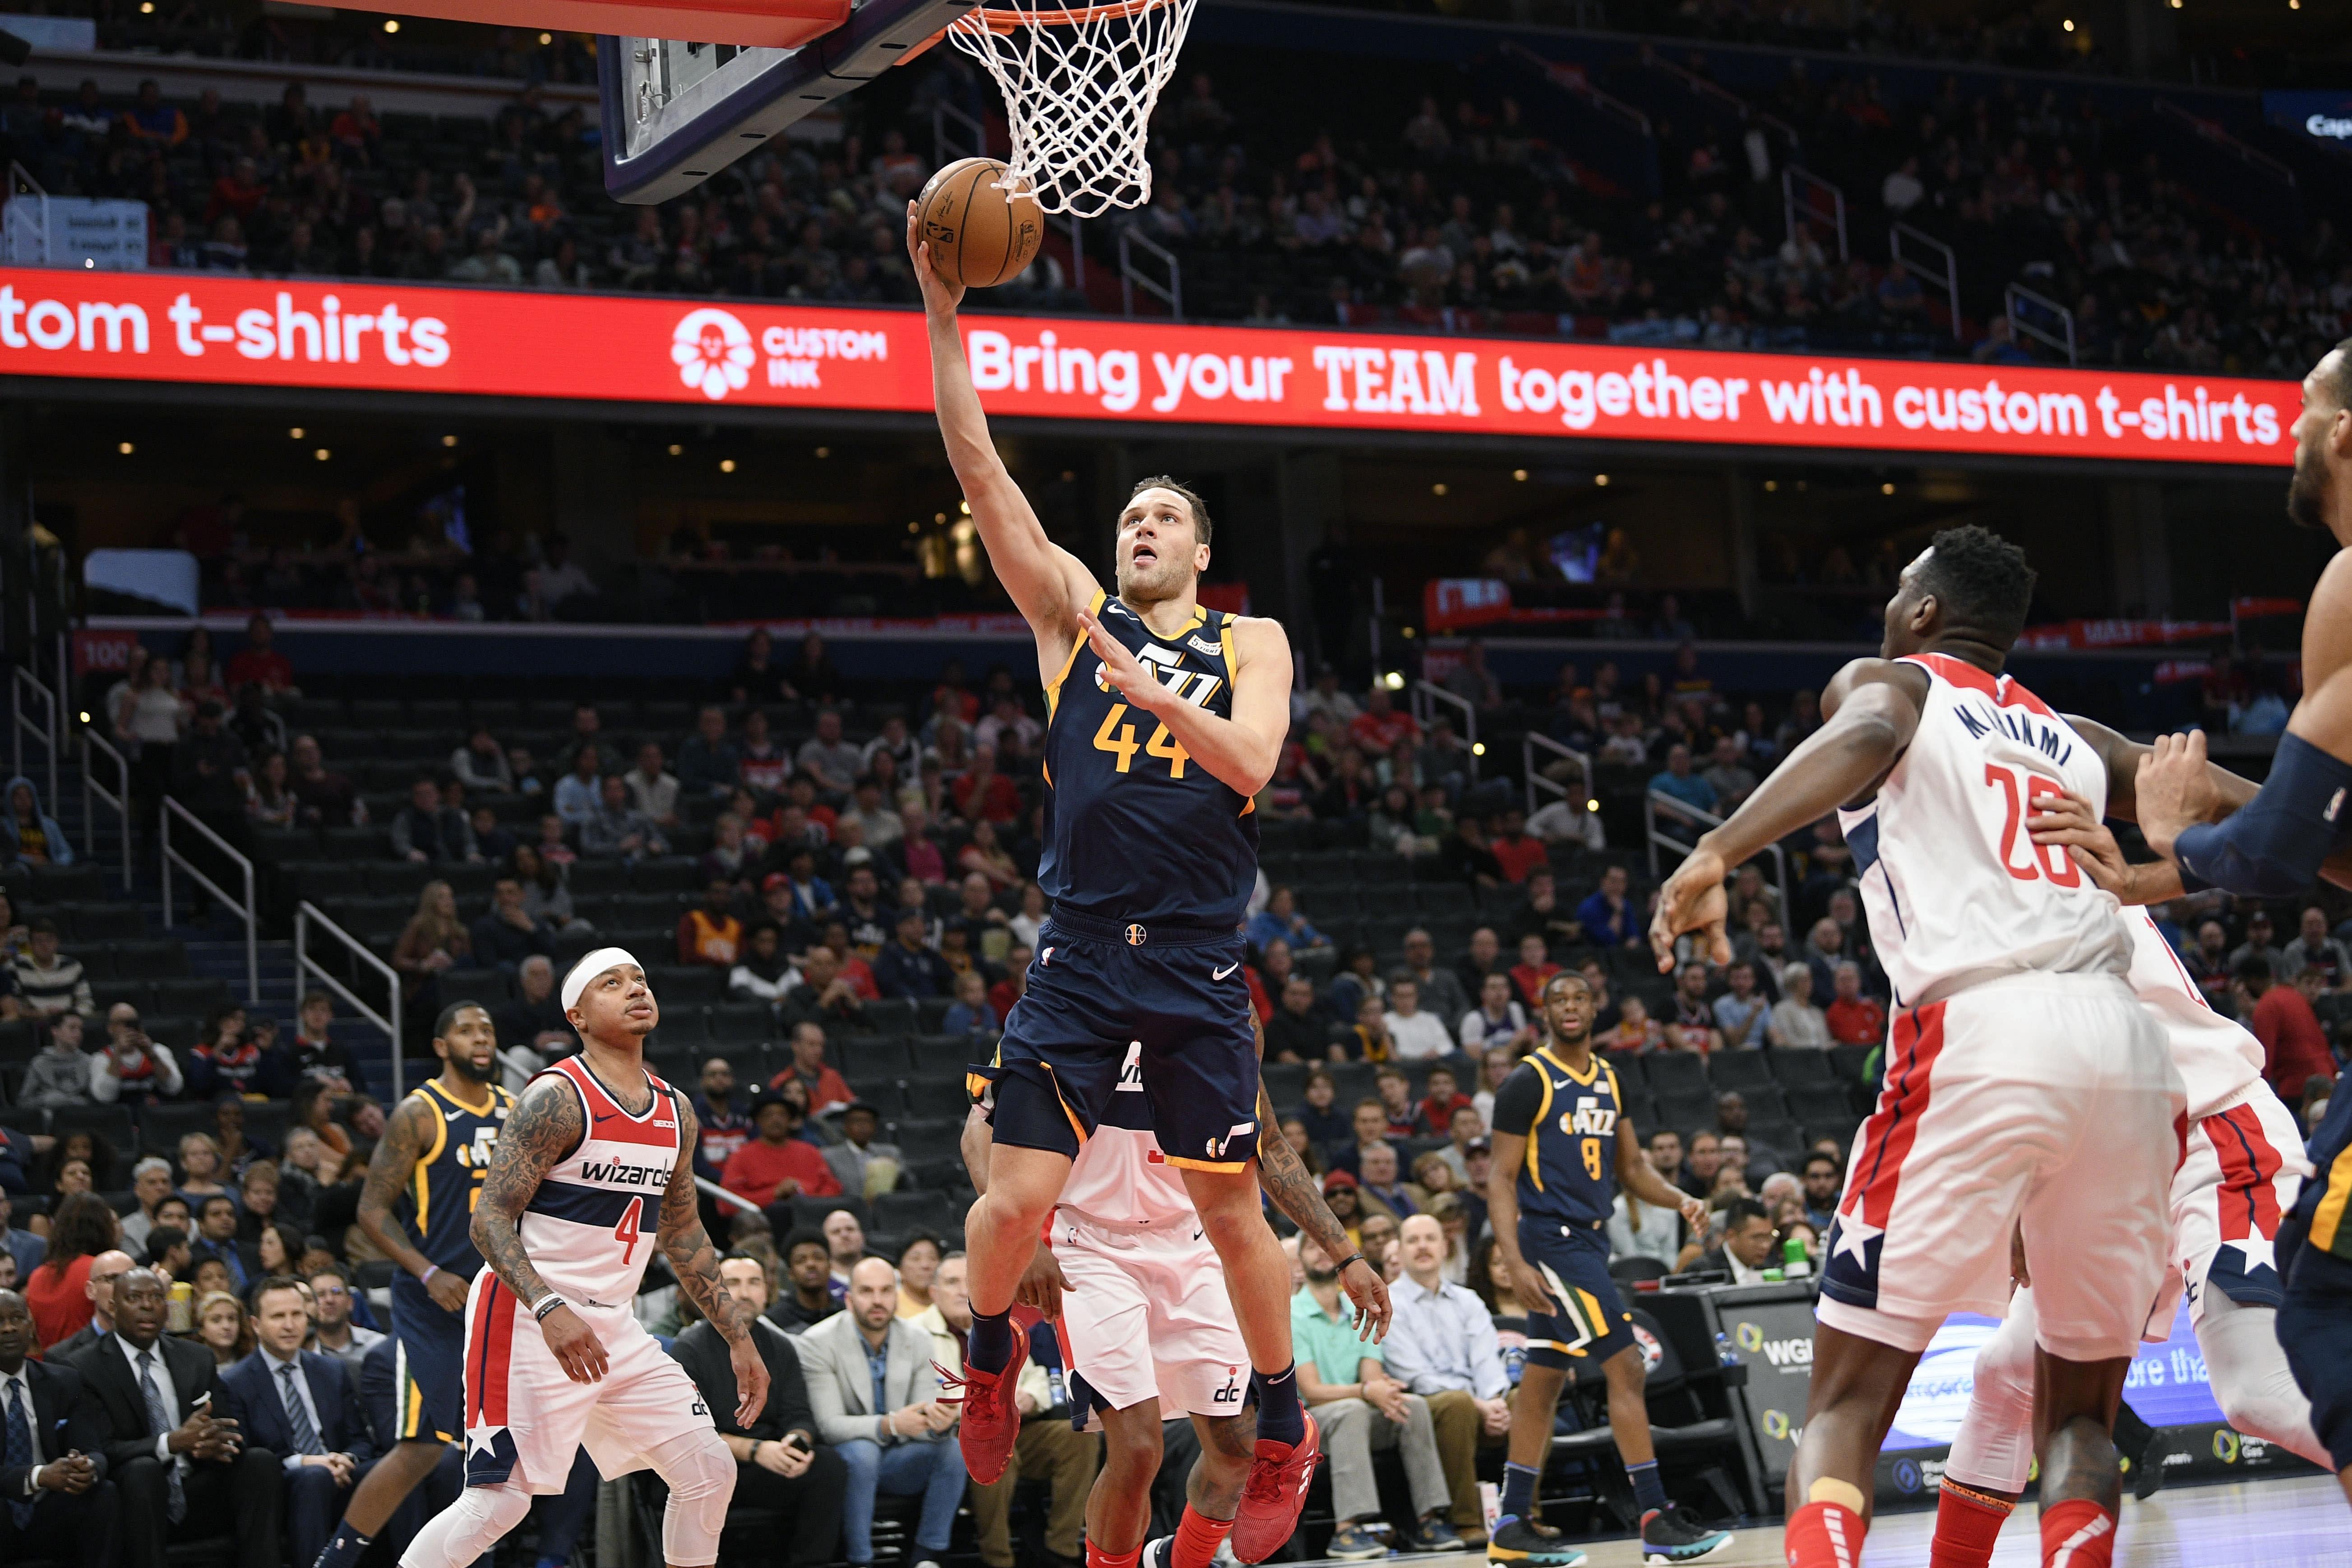 Utah Jazz forward Bojan Bogdanovic (44) goes to the basket against Washington Wizards guard Isaiah Thomas (4) and center Ian Mahinmi (28) during the first half of an NBA basketball game, Sunday, Jan. 12, 2020, in Washington. (AP Photo/Nick Wass)